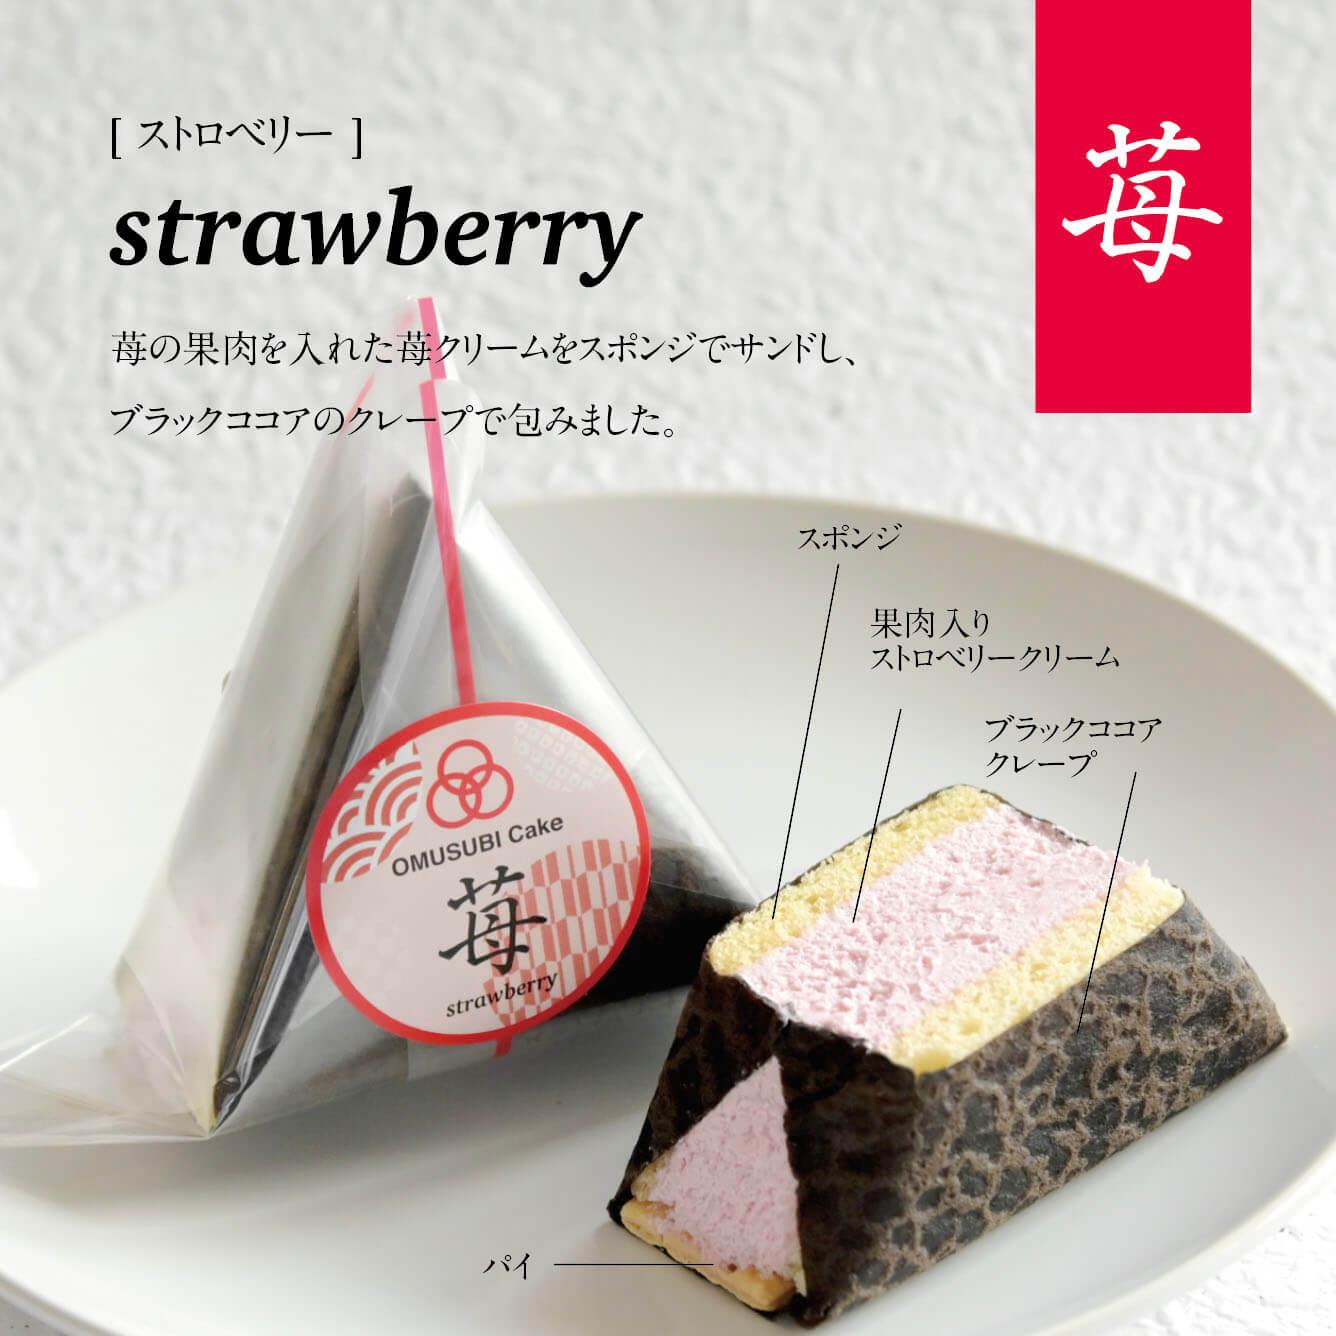 OMUSUBI Cake(おむすびケーキ)の『苺』